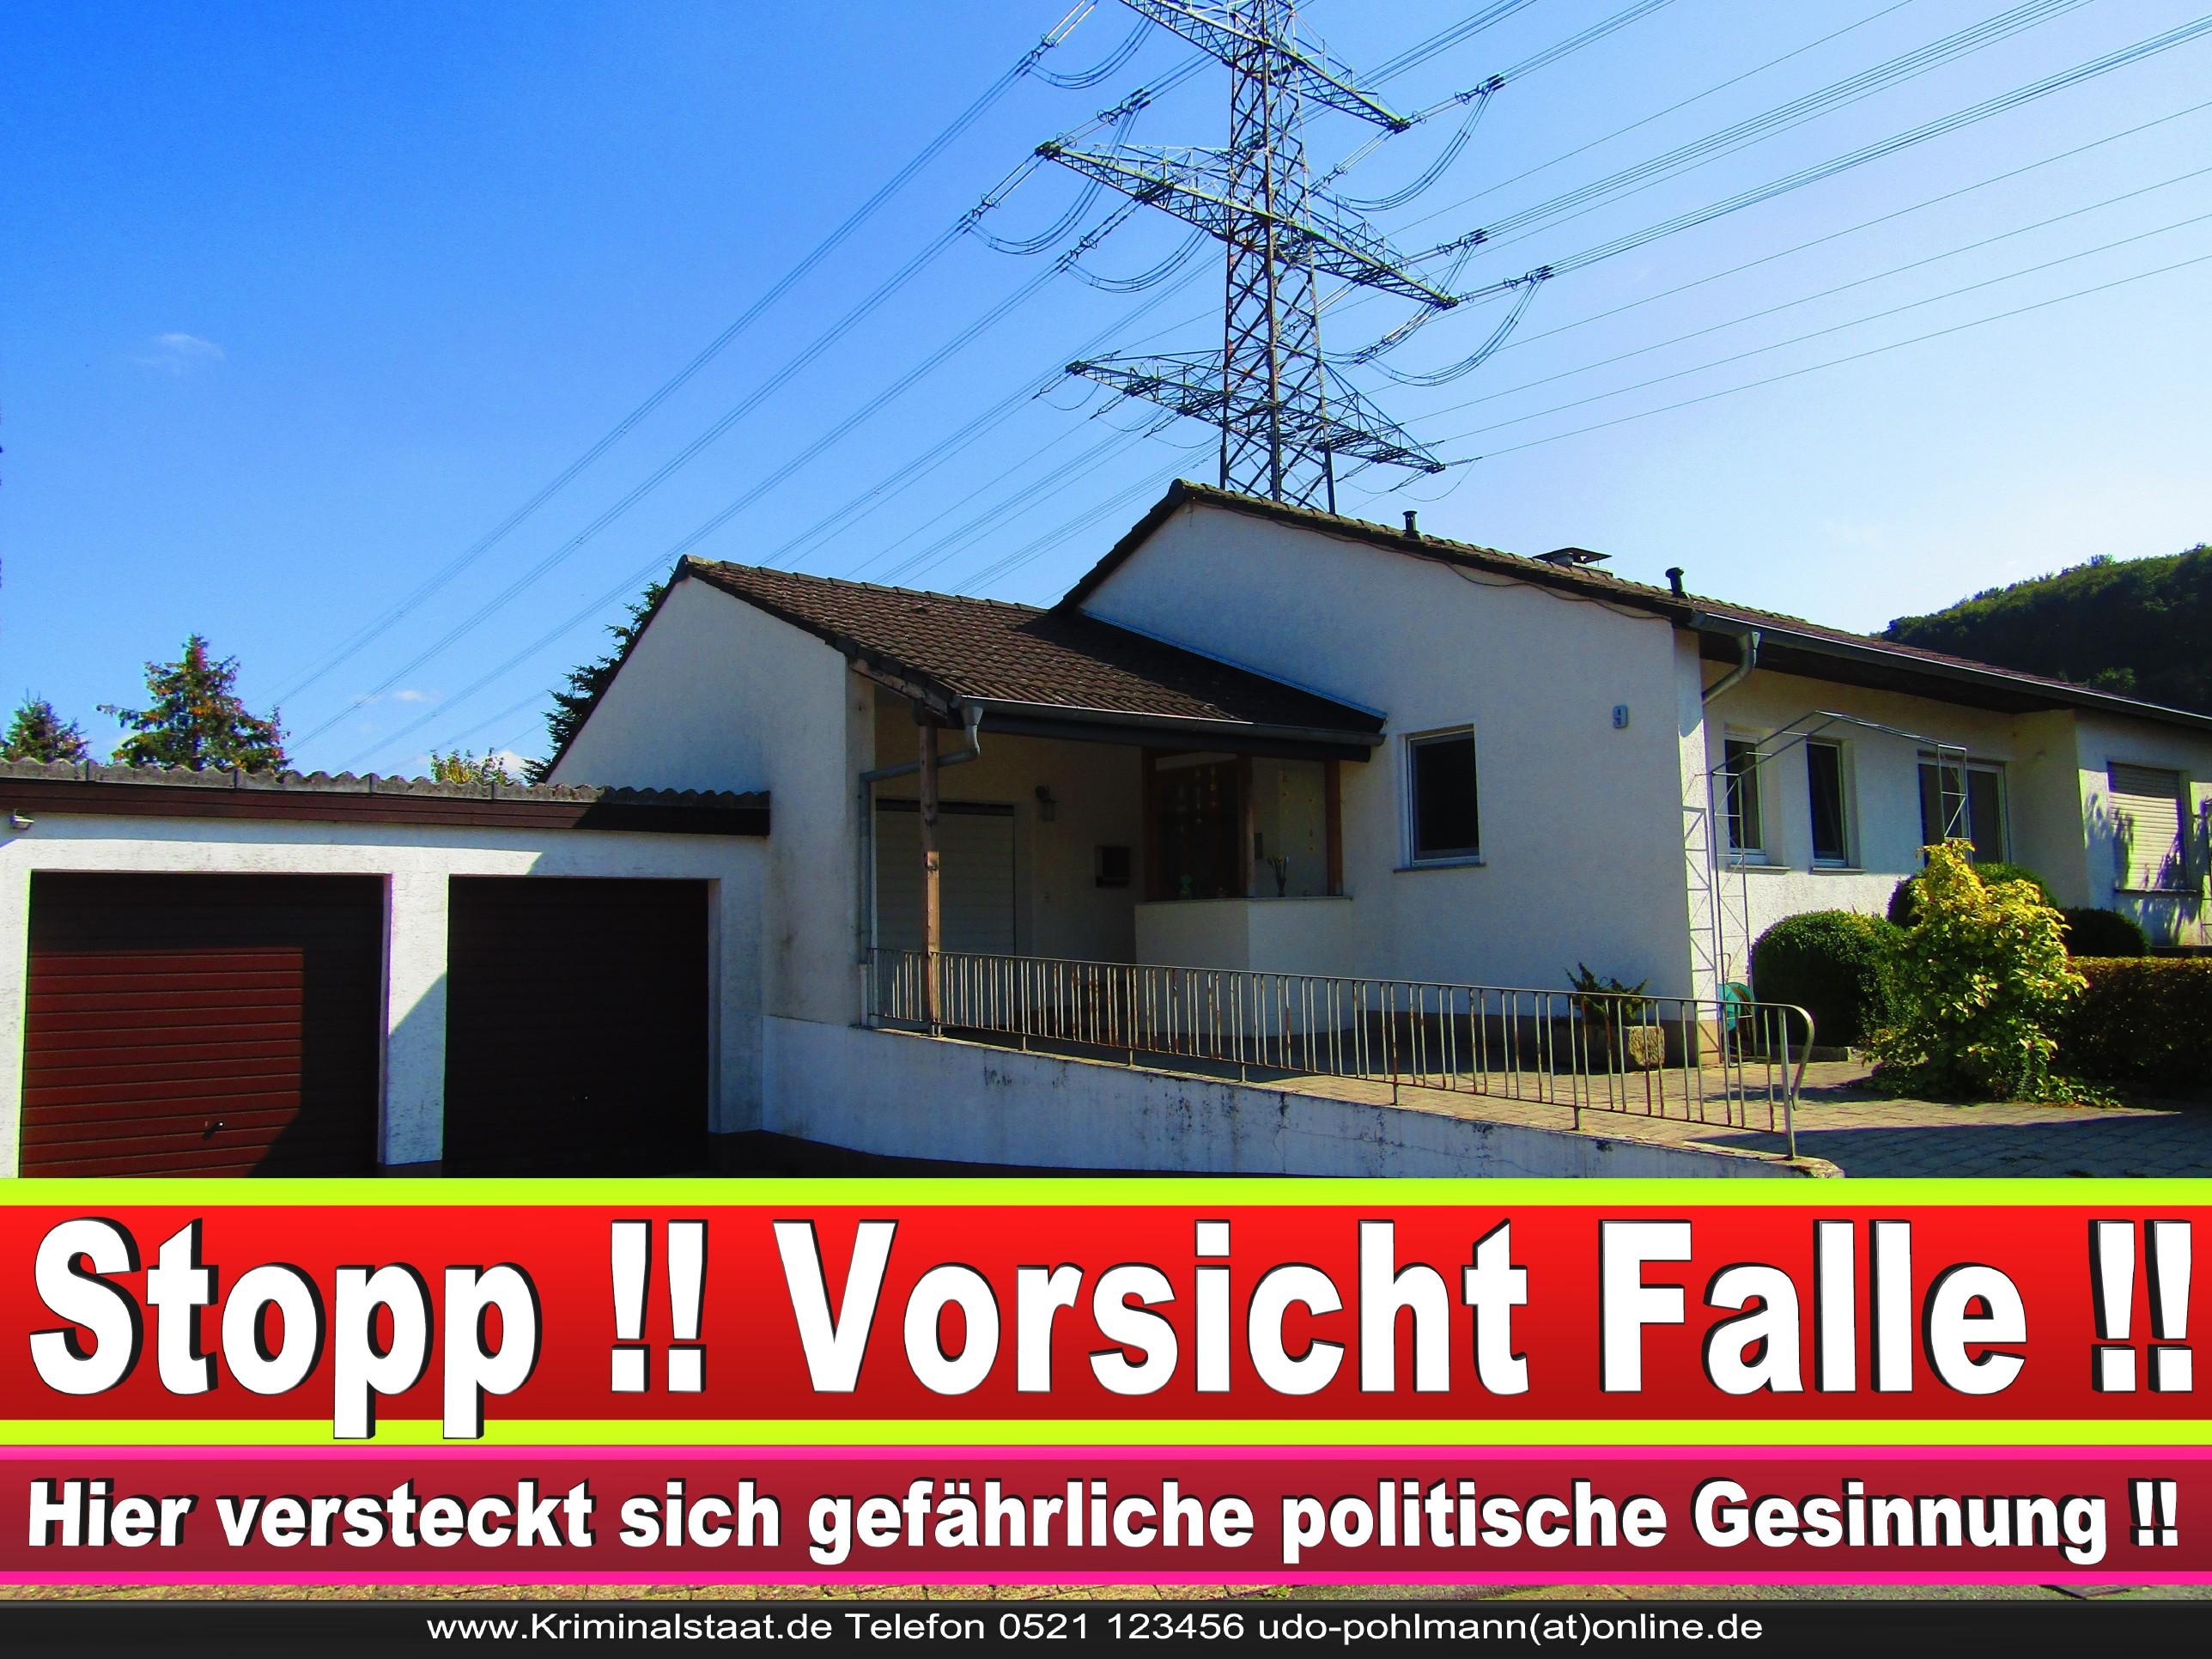 BERND KAMINSKI SCHIEßSPORT CDU BIELEFELD 3 LANDTAGSWAHL BUNDESTAGSWAHL BÜRGERMEISTERWAHL